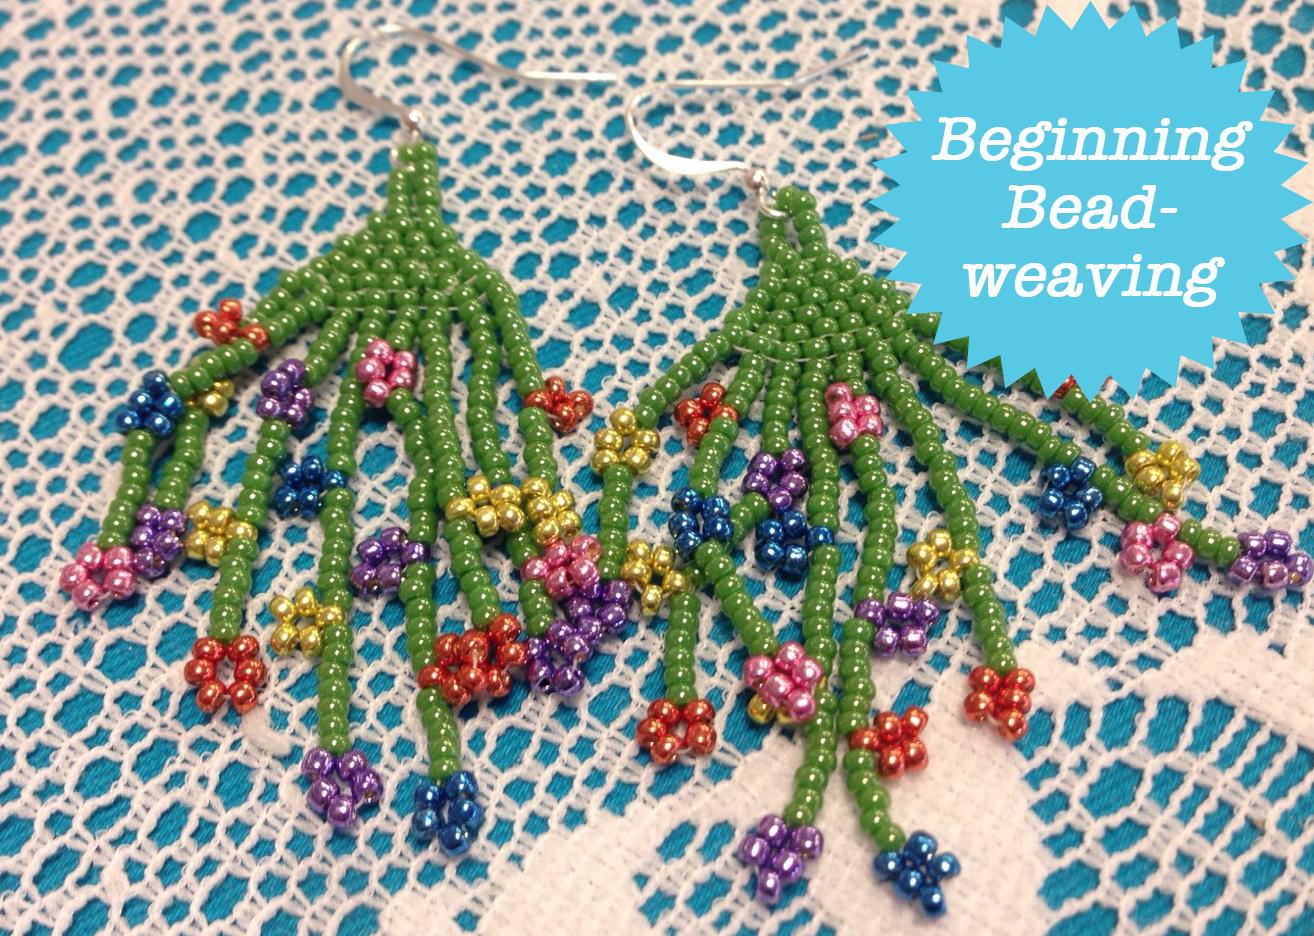 Store Kits BBS - Bountiful Garden Earrings Class Kit